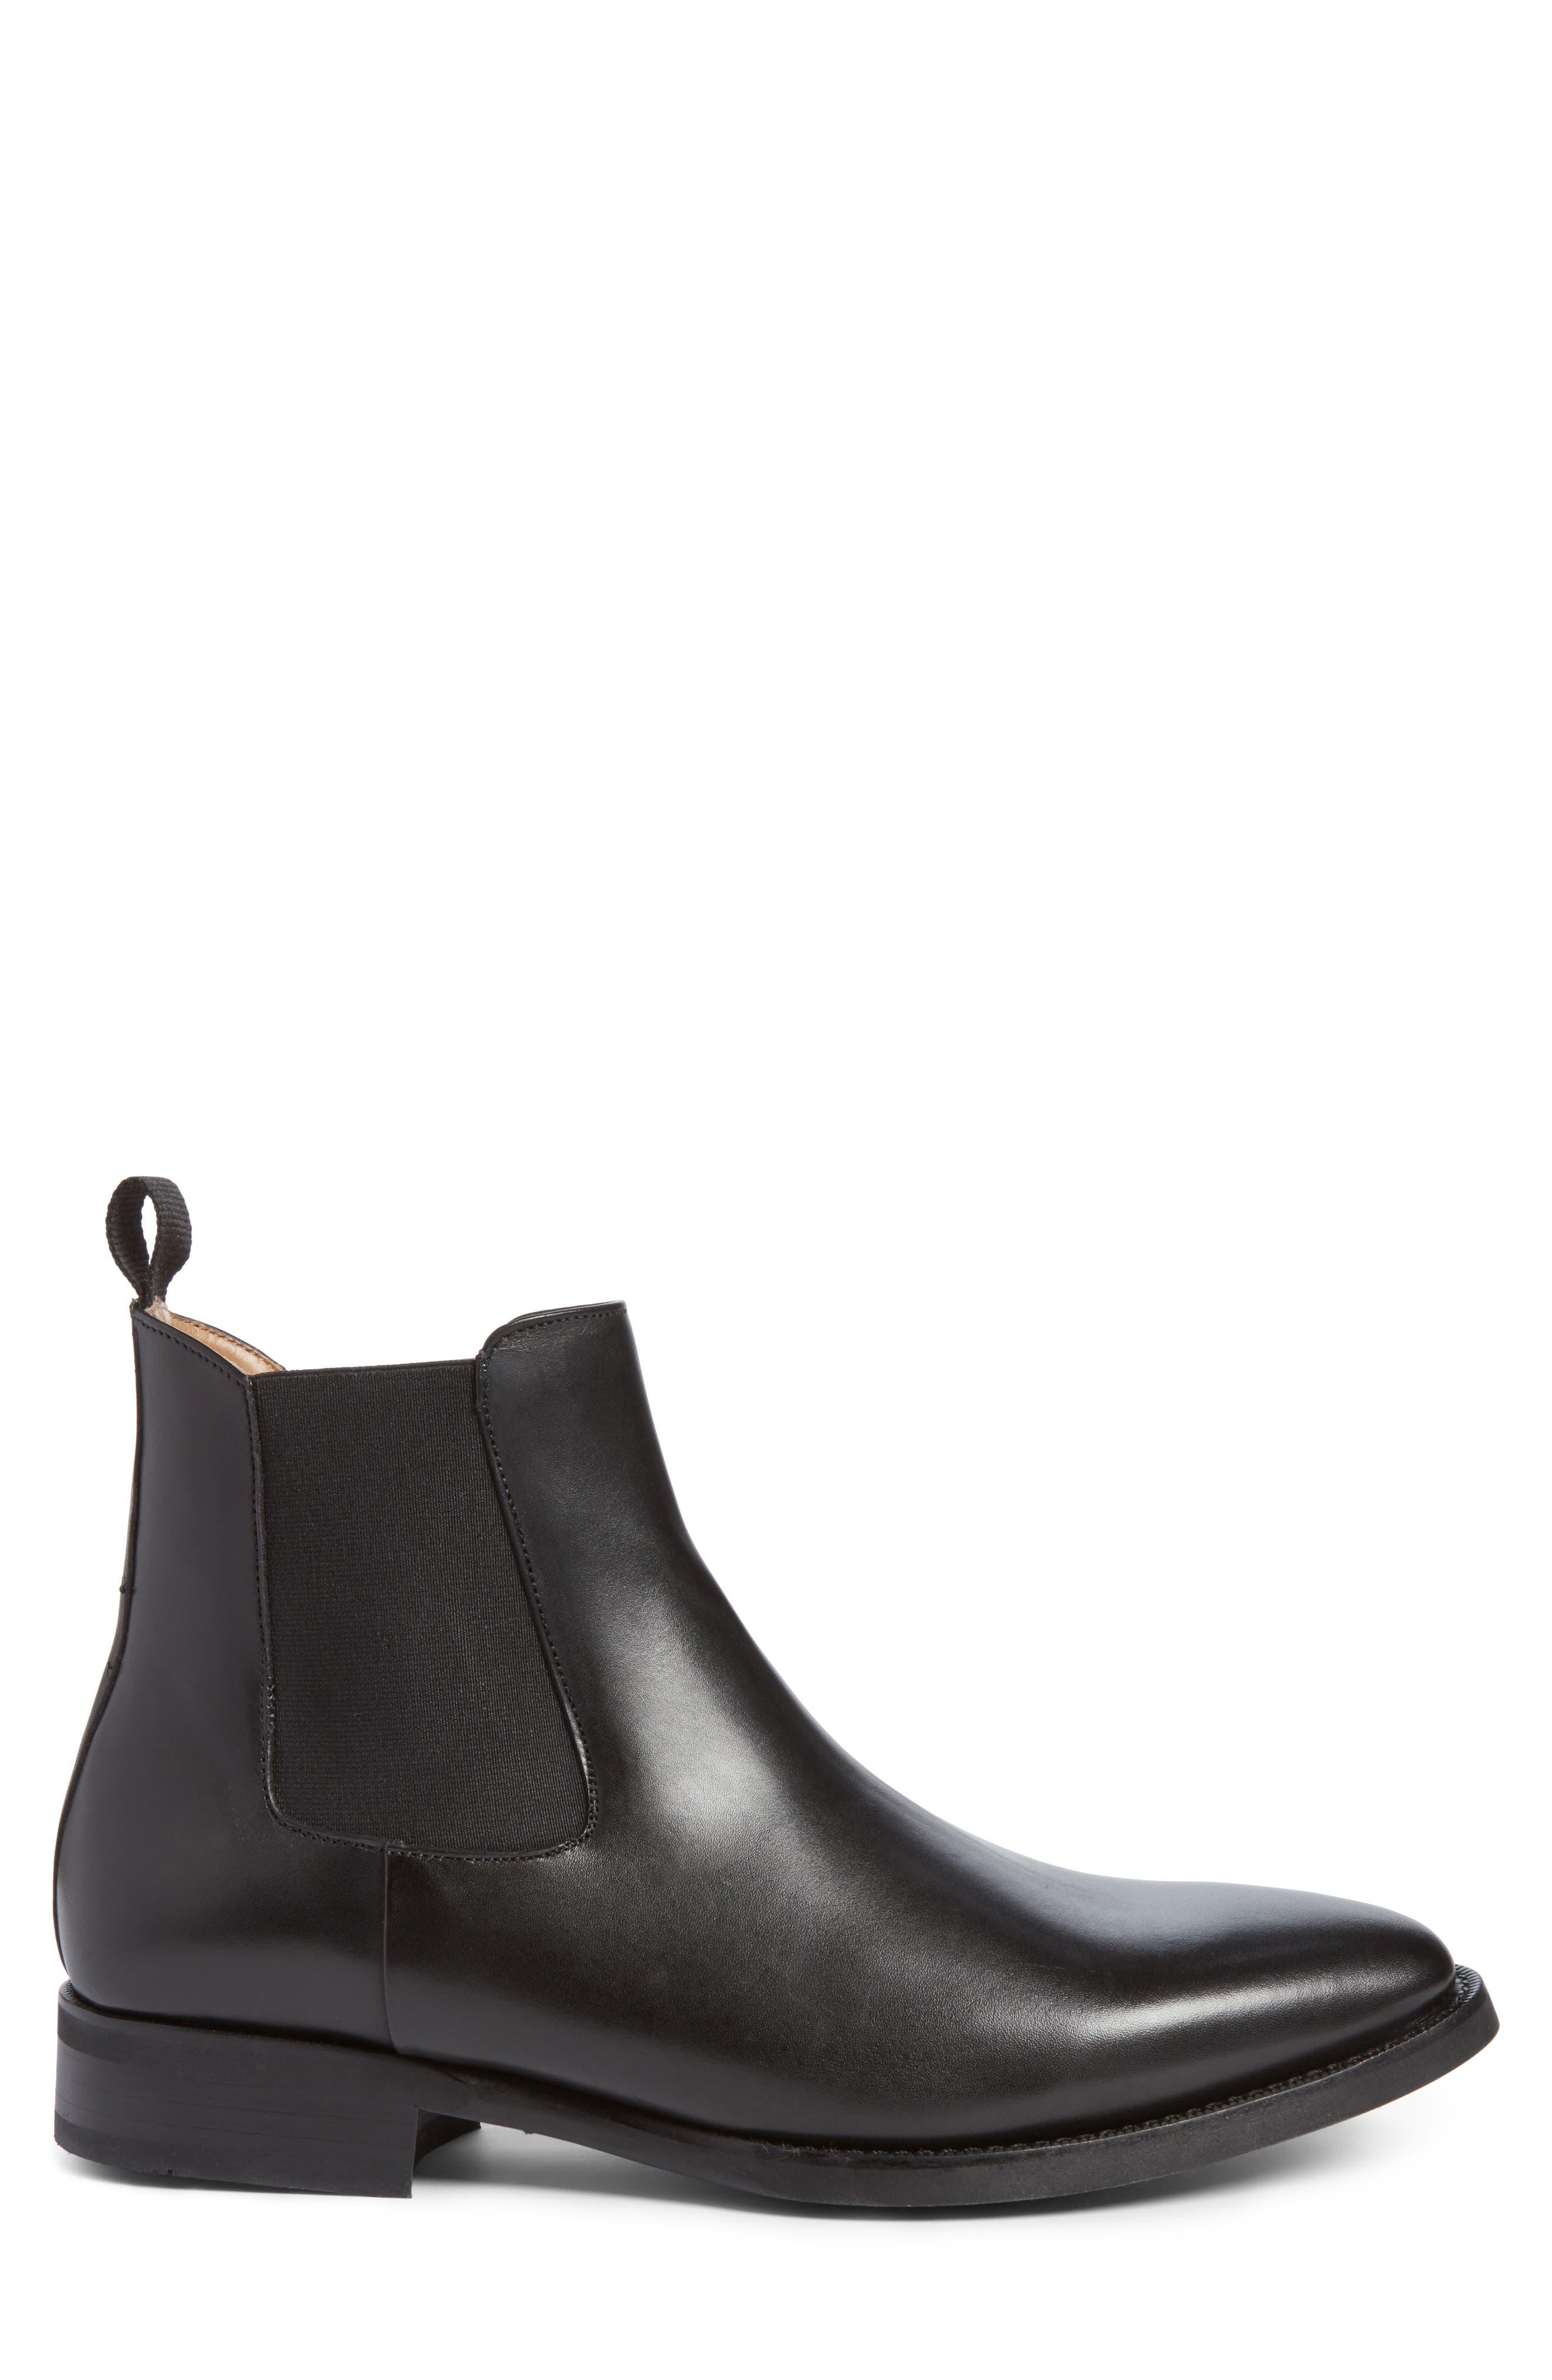 JACK ERWIN, Ellis Water Resistant Chelsea Boot, Alternate thumbnail 3, color, BLACK LEATHER